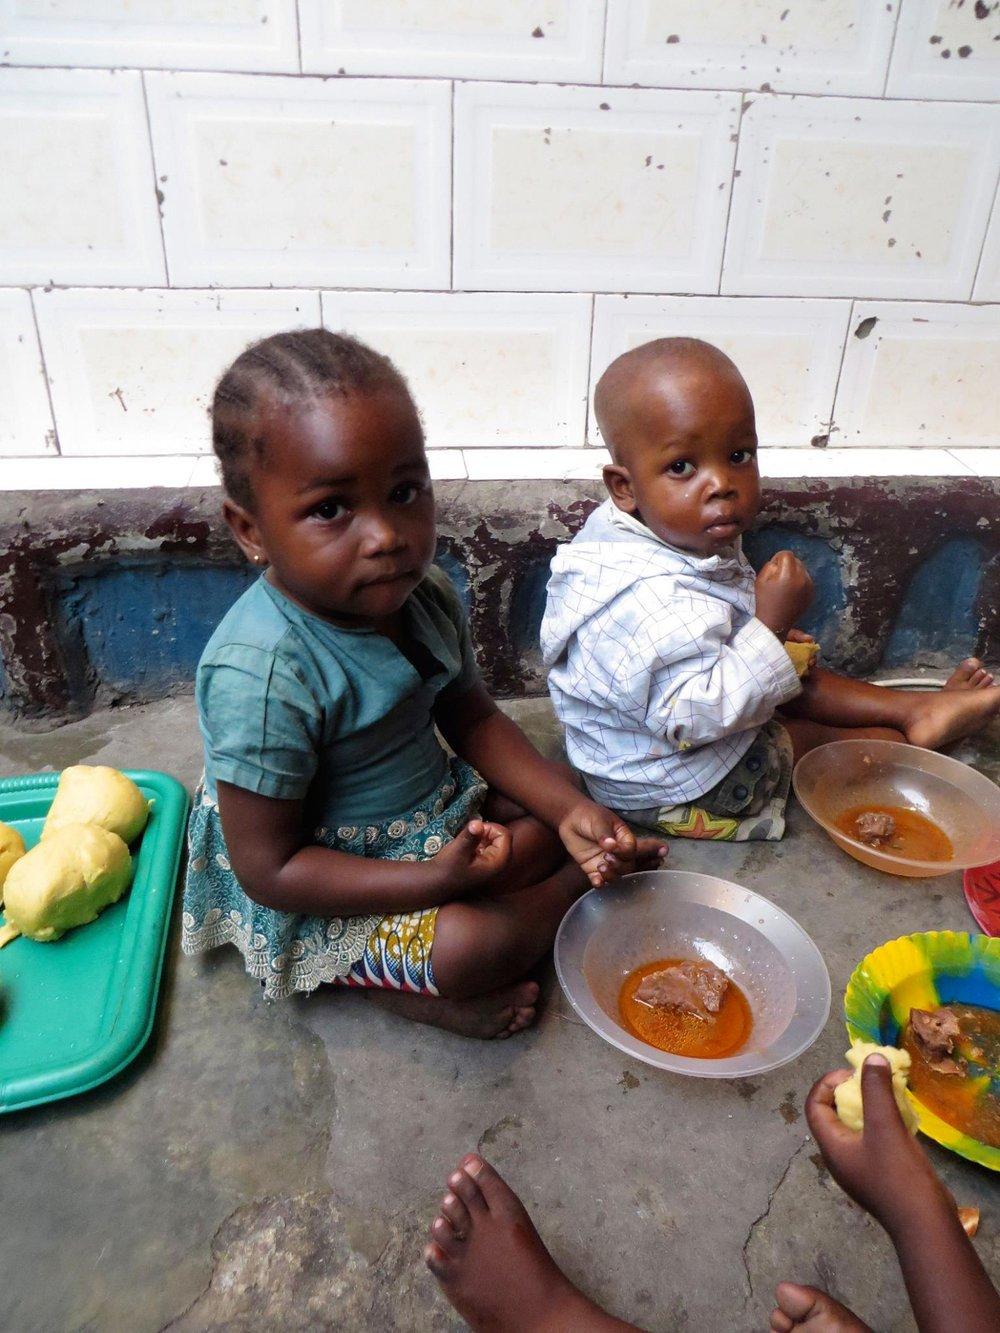 Children eating at the Amiband orphanage.